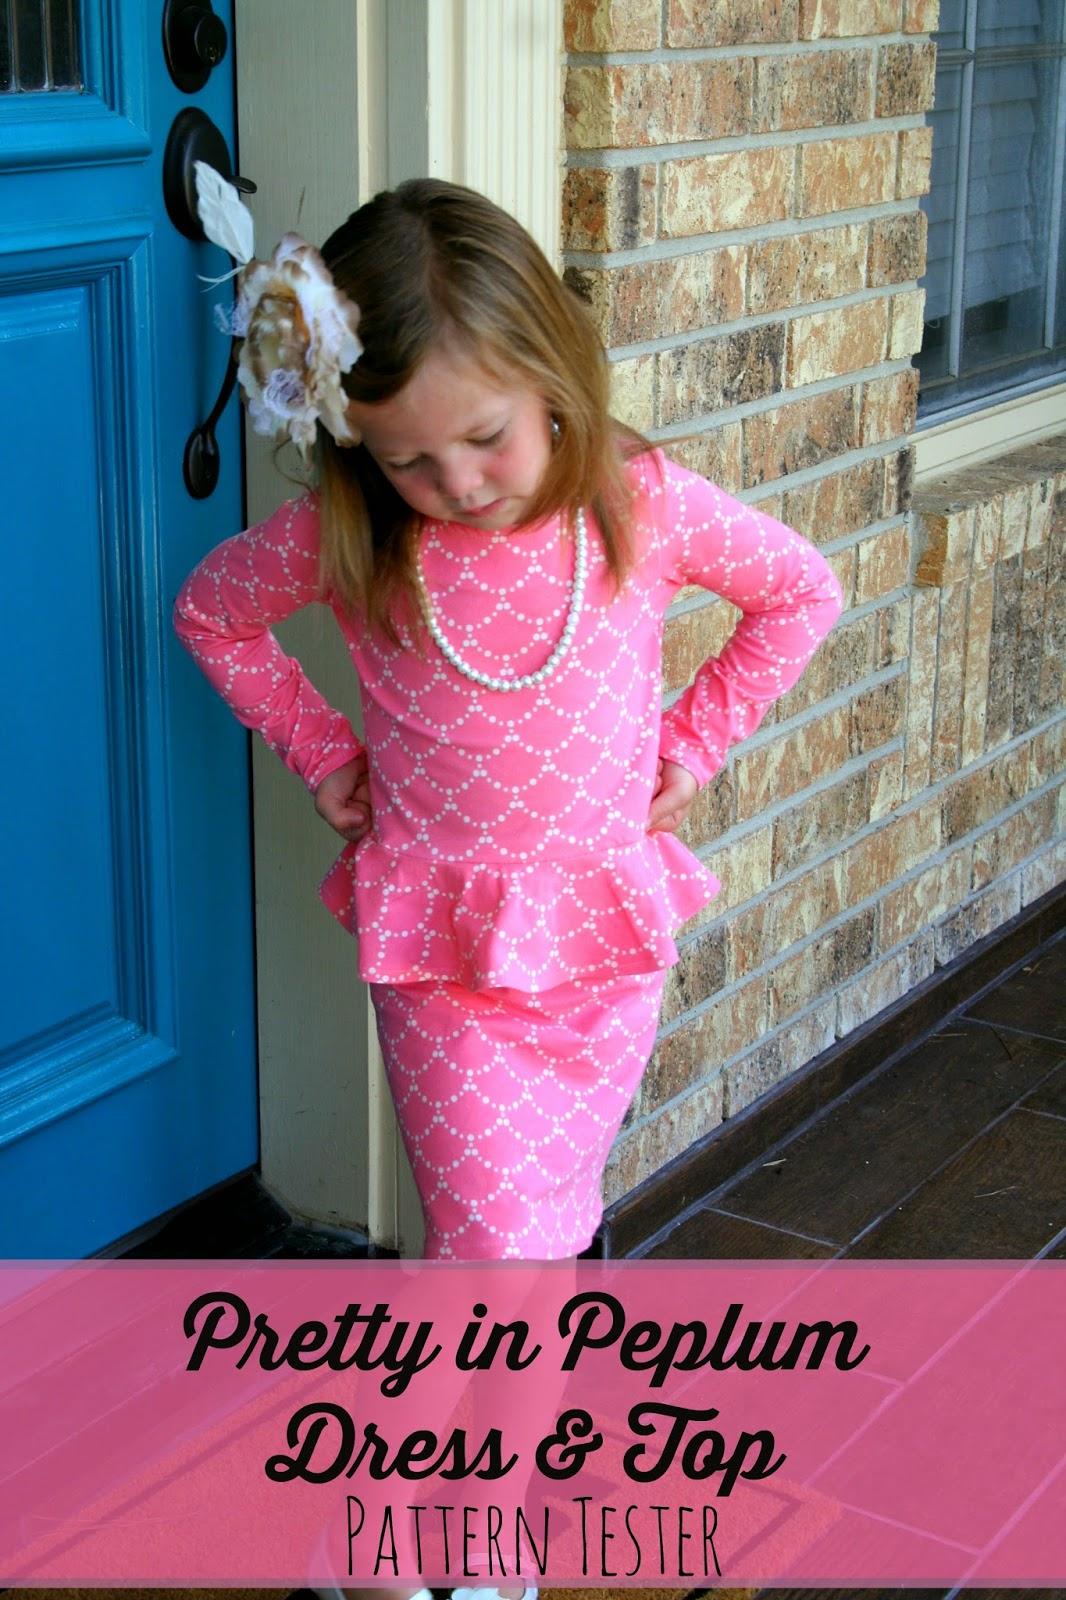 Huckleberry Love: Pretty in Peplum Dress {Pattern Tester}